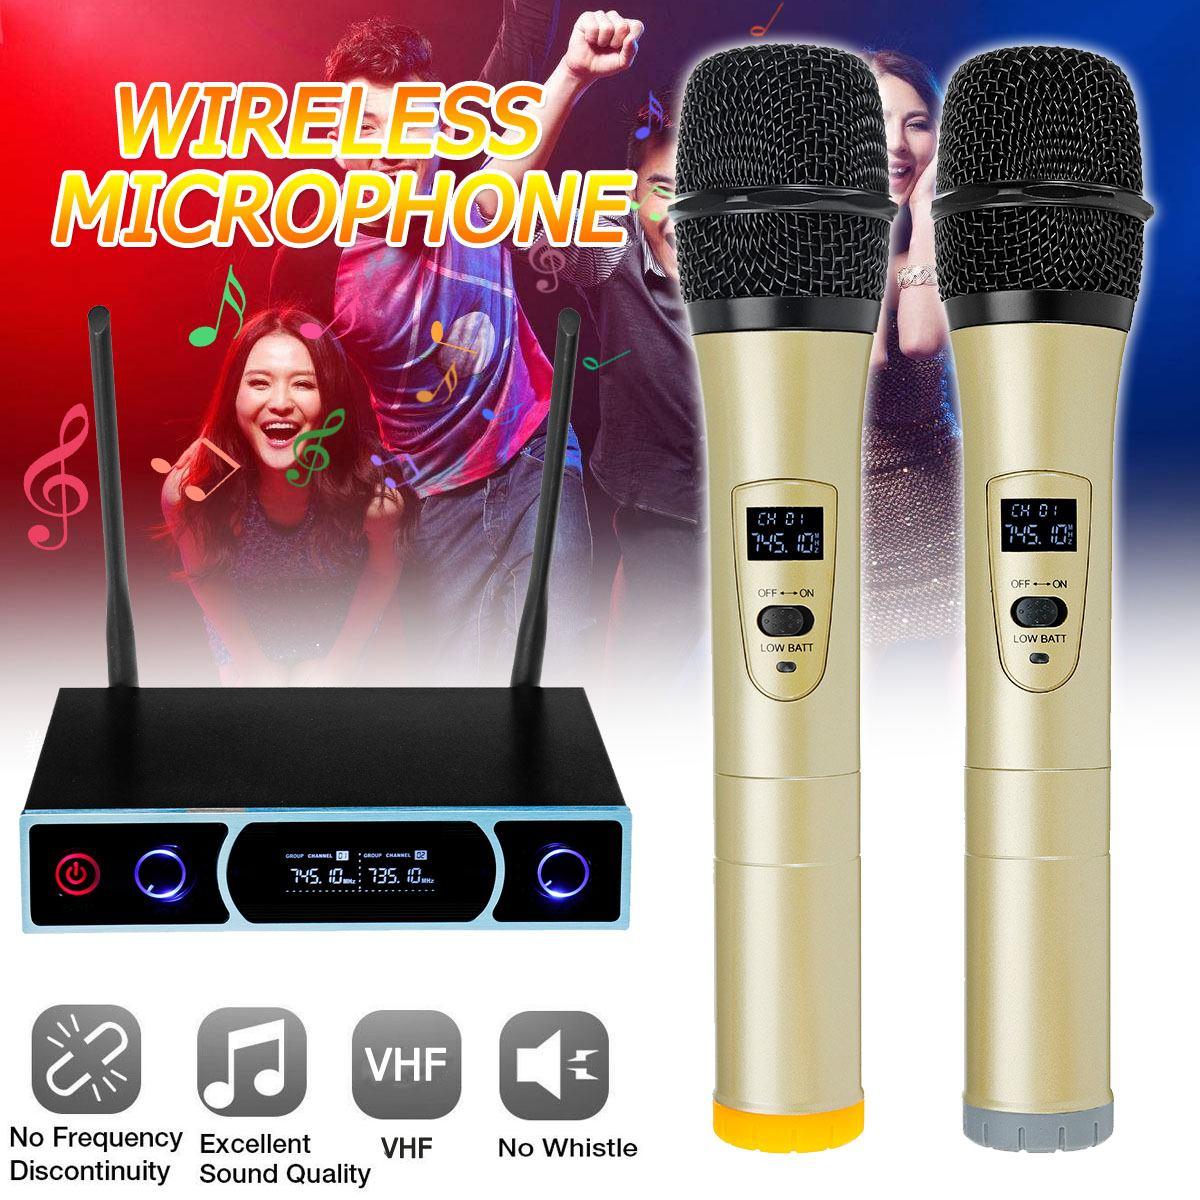 Studio Dual VHF Wireless Microphone Wireless Microphone System Family Video 2 x Cordless Microphones + Receiver for Karaoke KTVStudio Dual VHF Wireless Microphone Wireless Microphone System Family Video 2 x Cordless Microphones + Receiver for Karaoke KTV